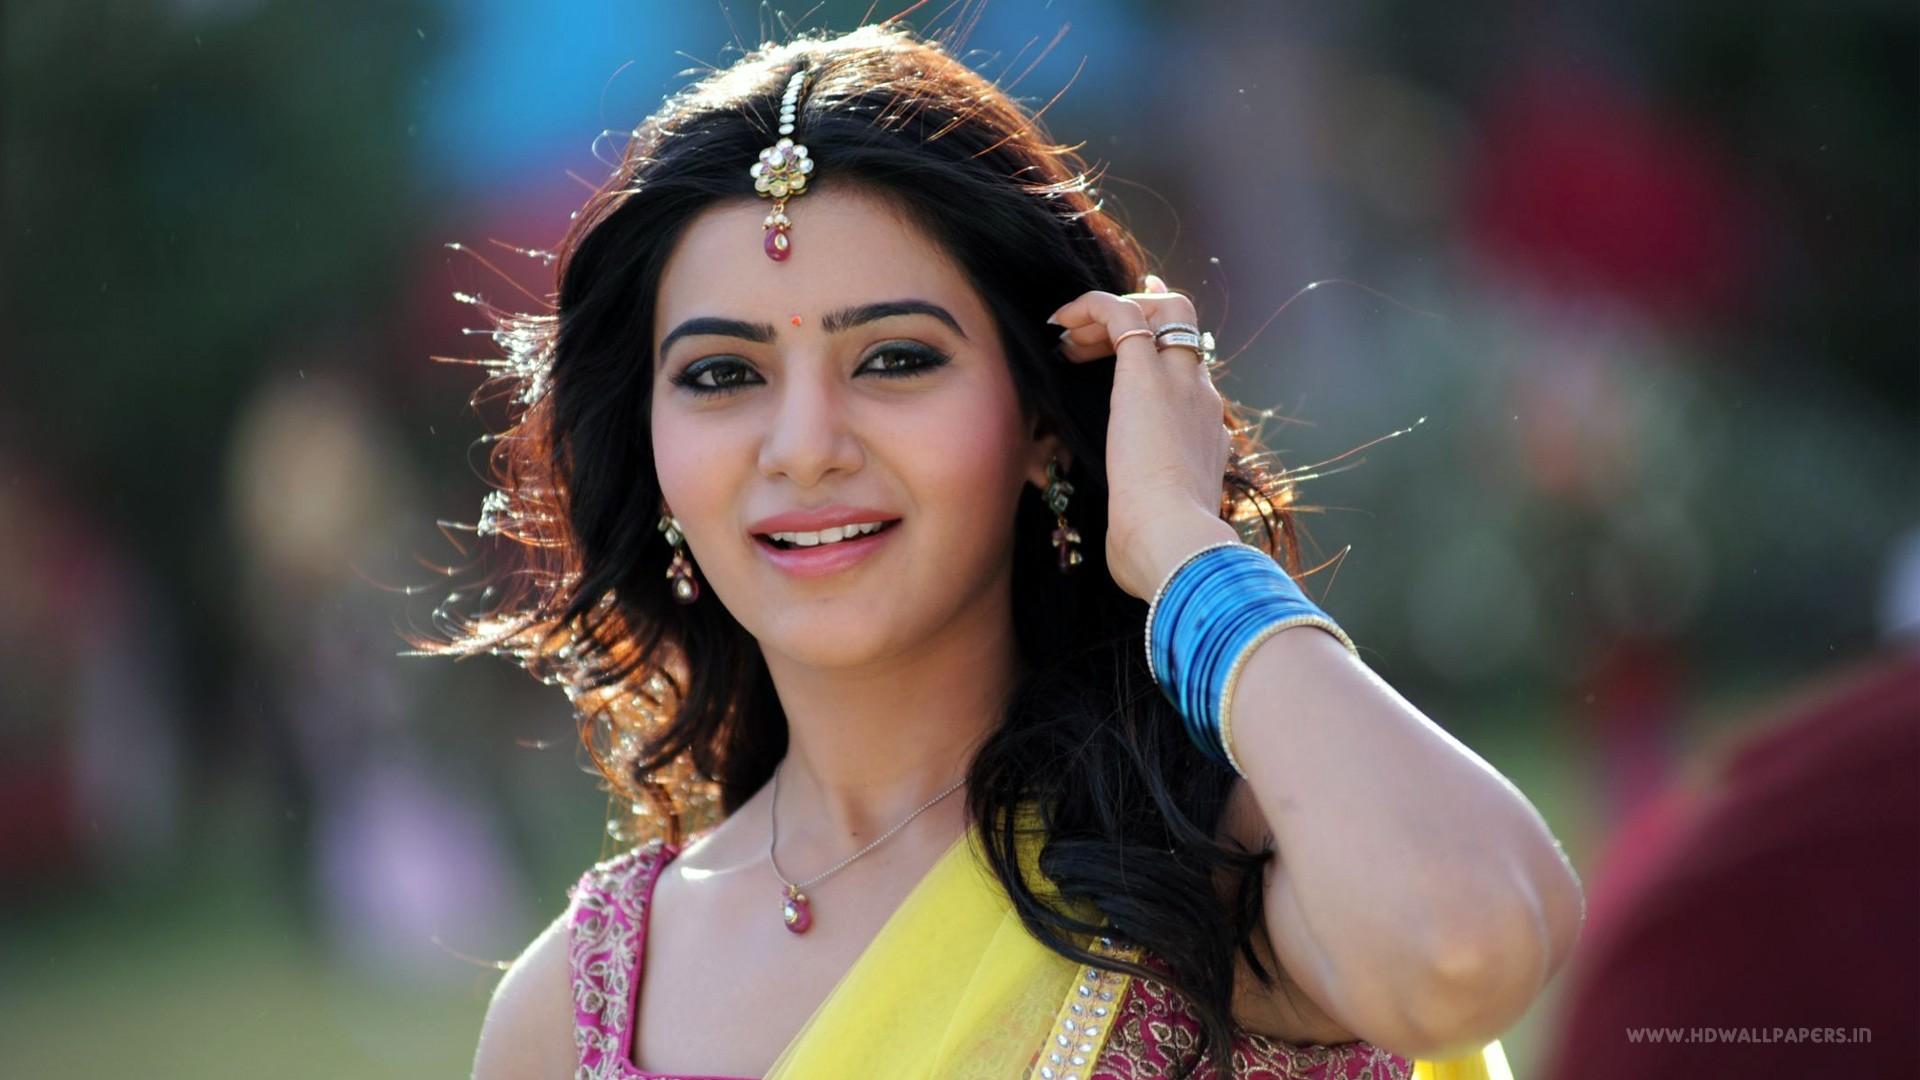 Cute Aishwarya Rai Wallpapers Samantha Beautiful Wallpapers Hd Wallpapers Id 17241